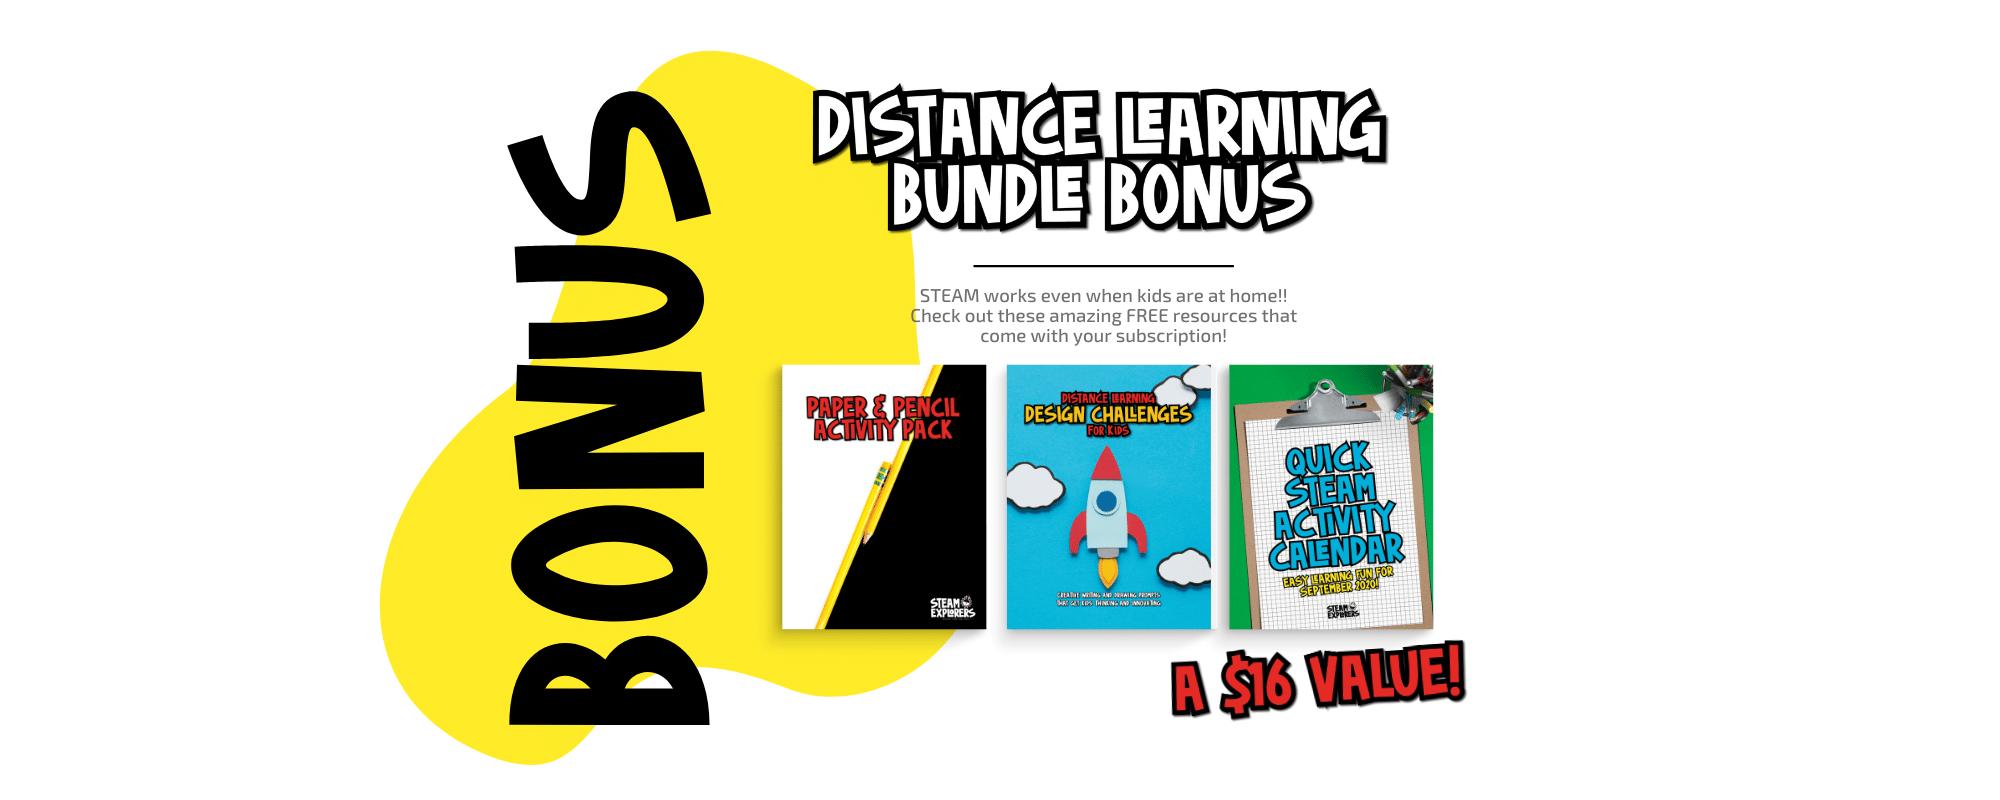 bonus distance learning v3